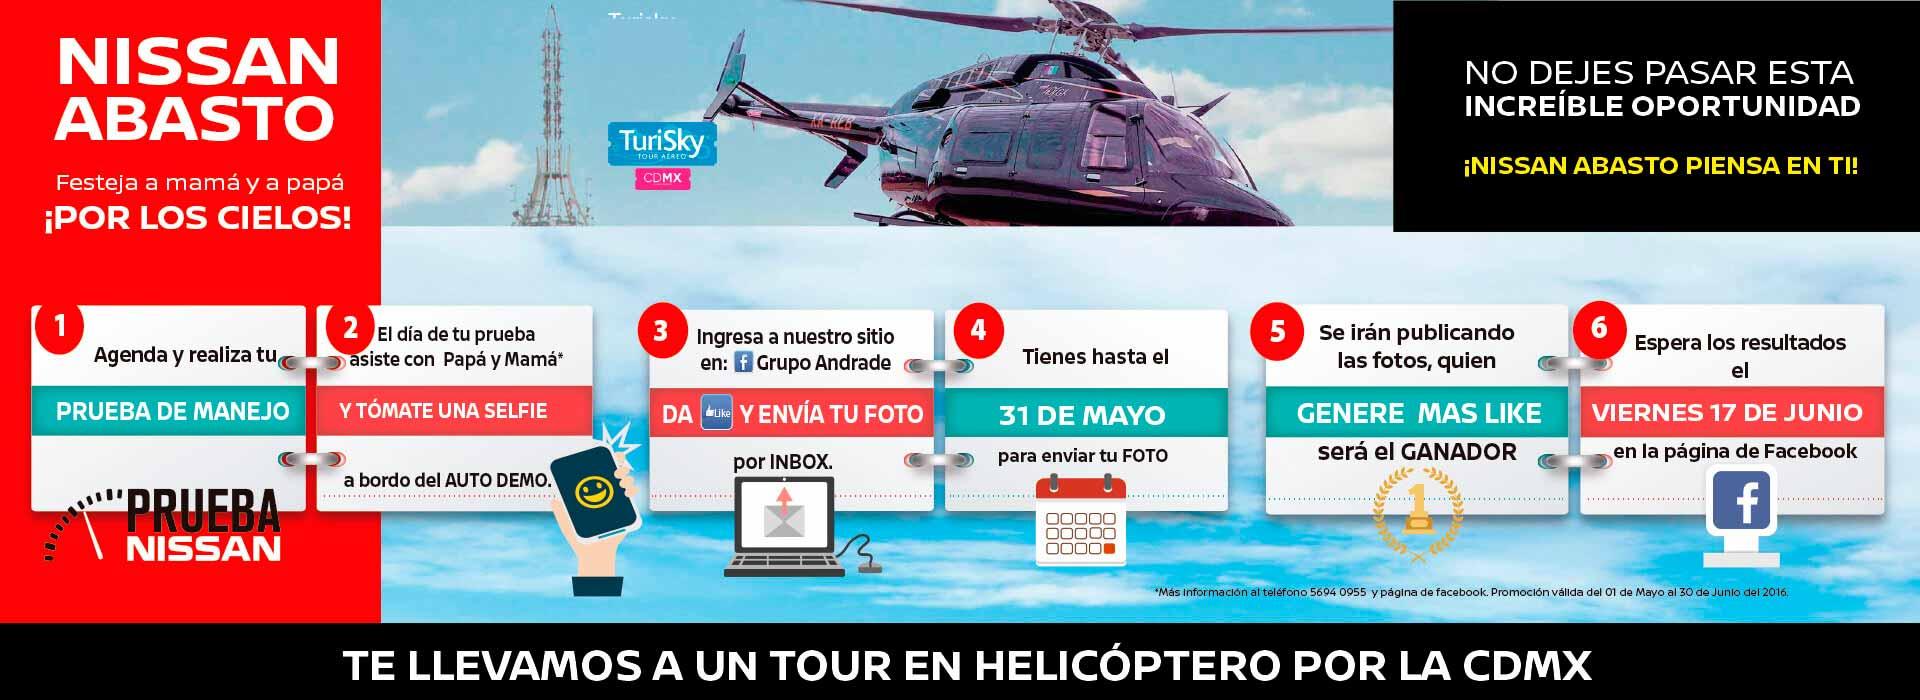 http://www.nissanabasto.mx/prueba-de-manejo-es-mx.htm